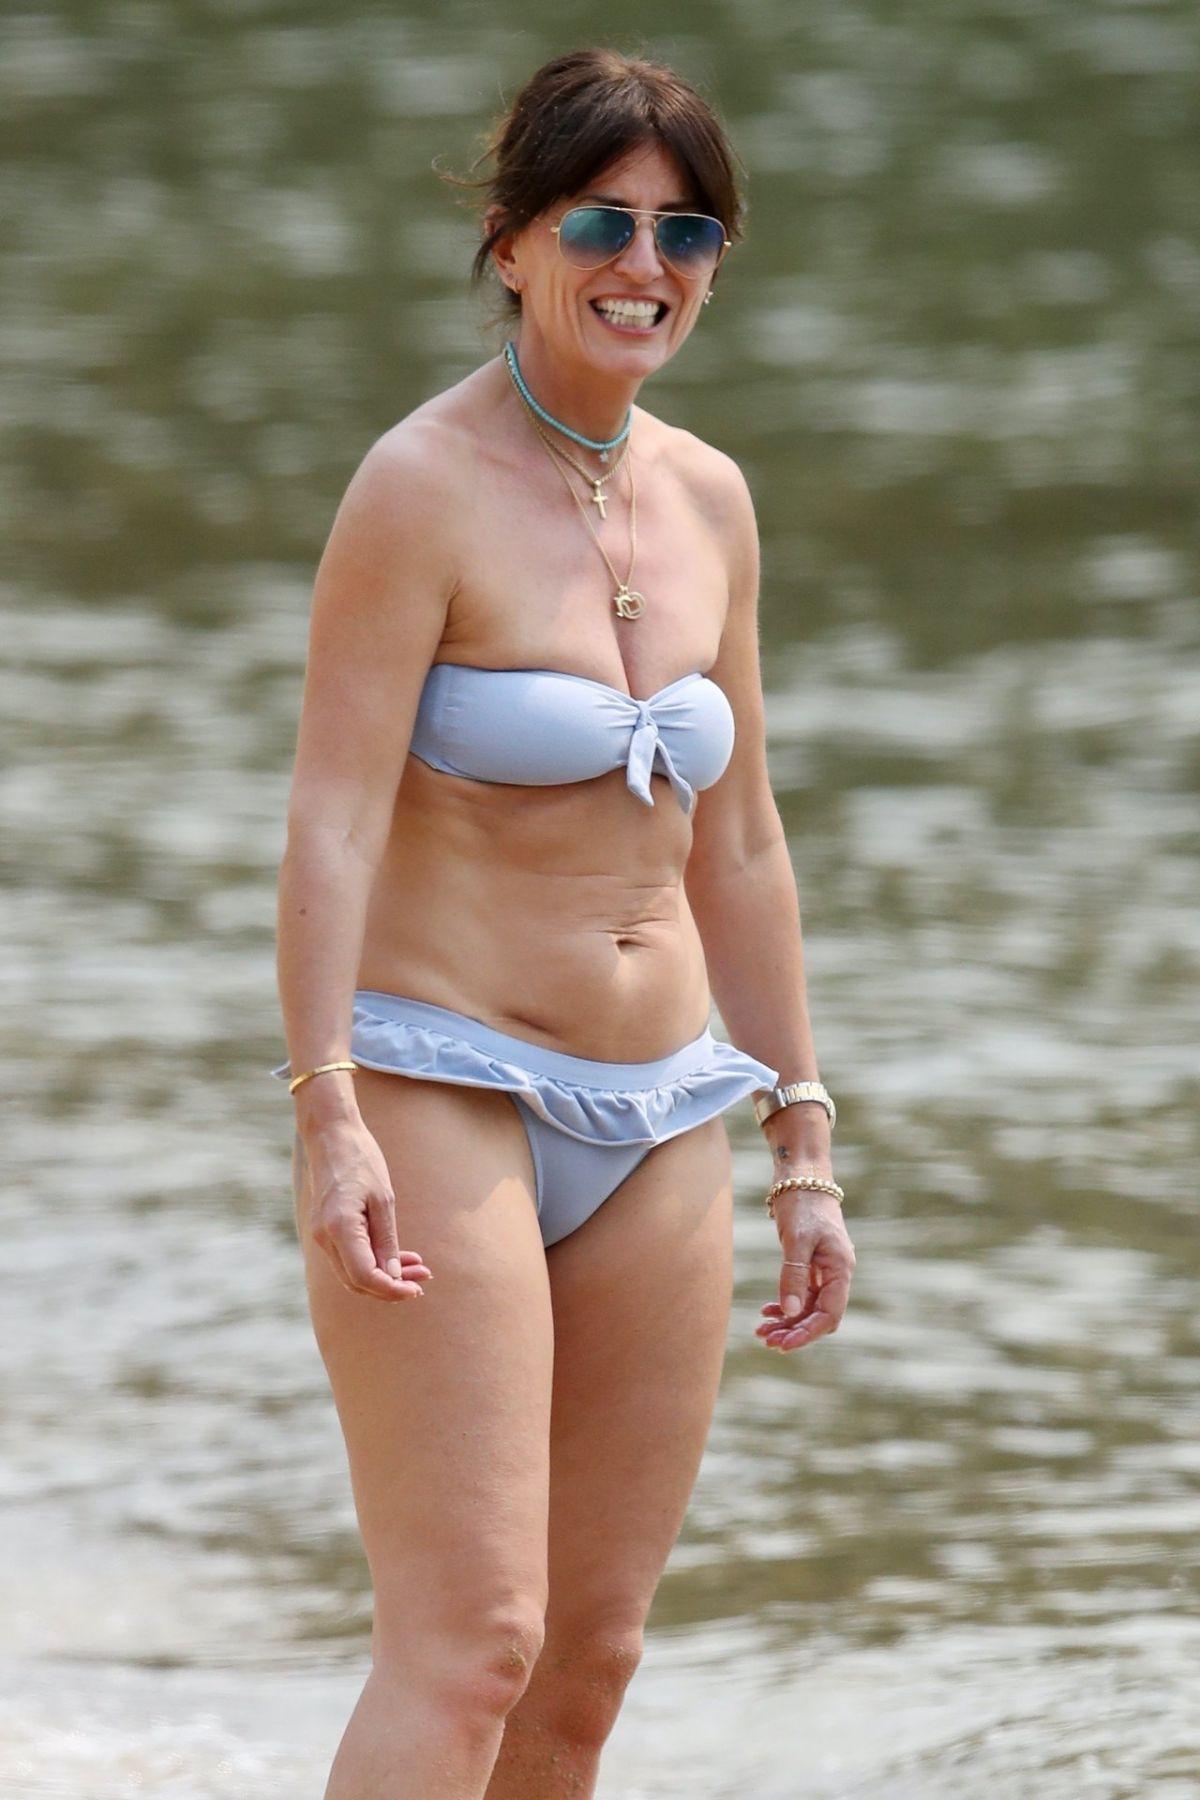 Davina mccall bikini Davina McCall Nude: